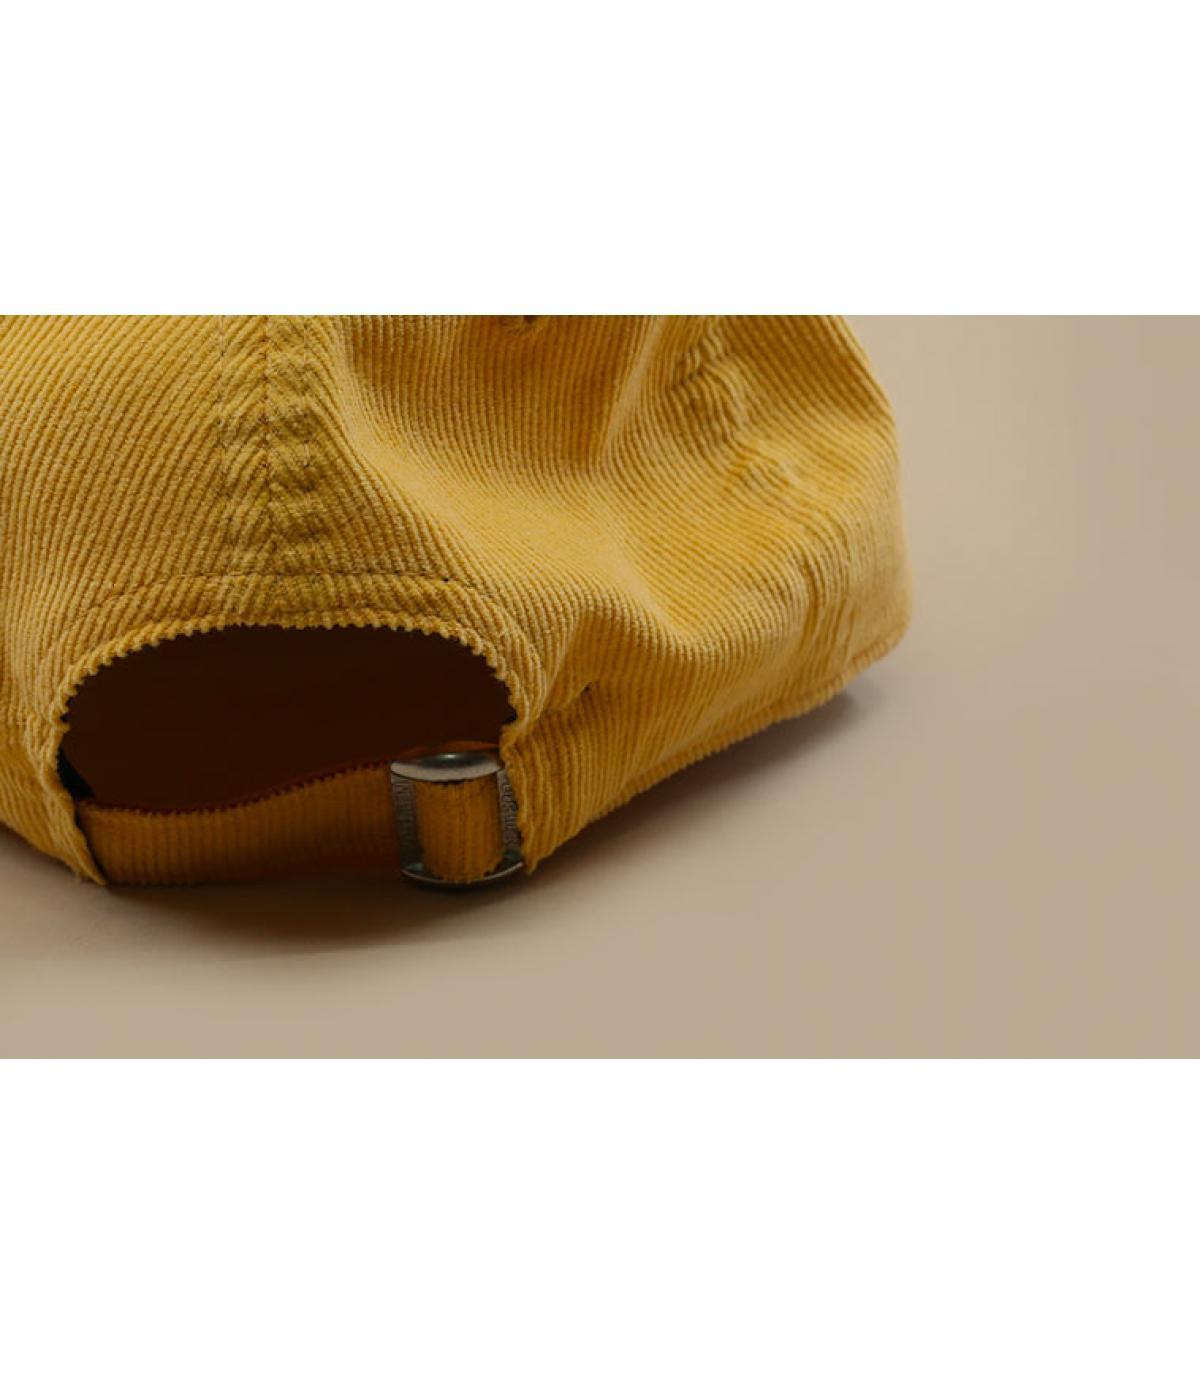 Dettagli Cord Pack 940 NY mellow yellow black - image 5